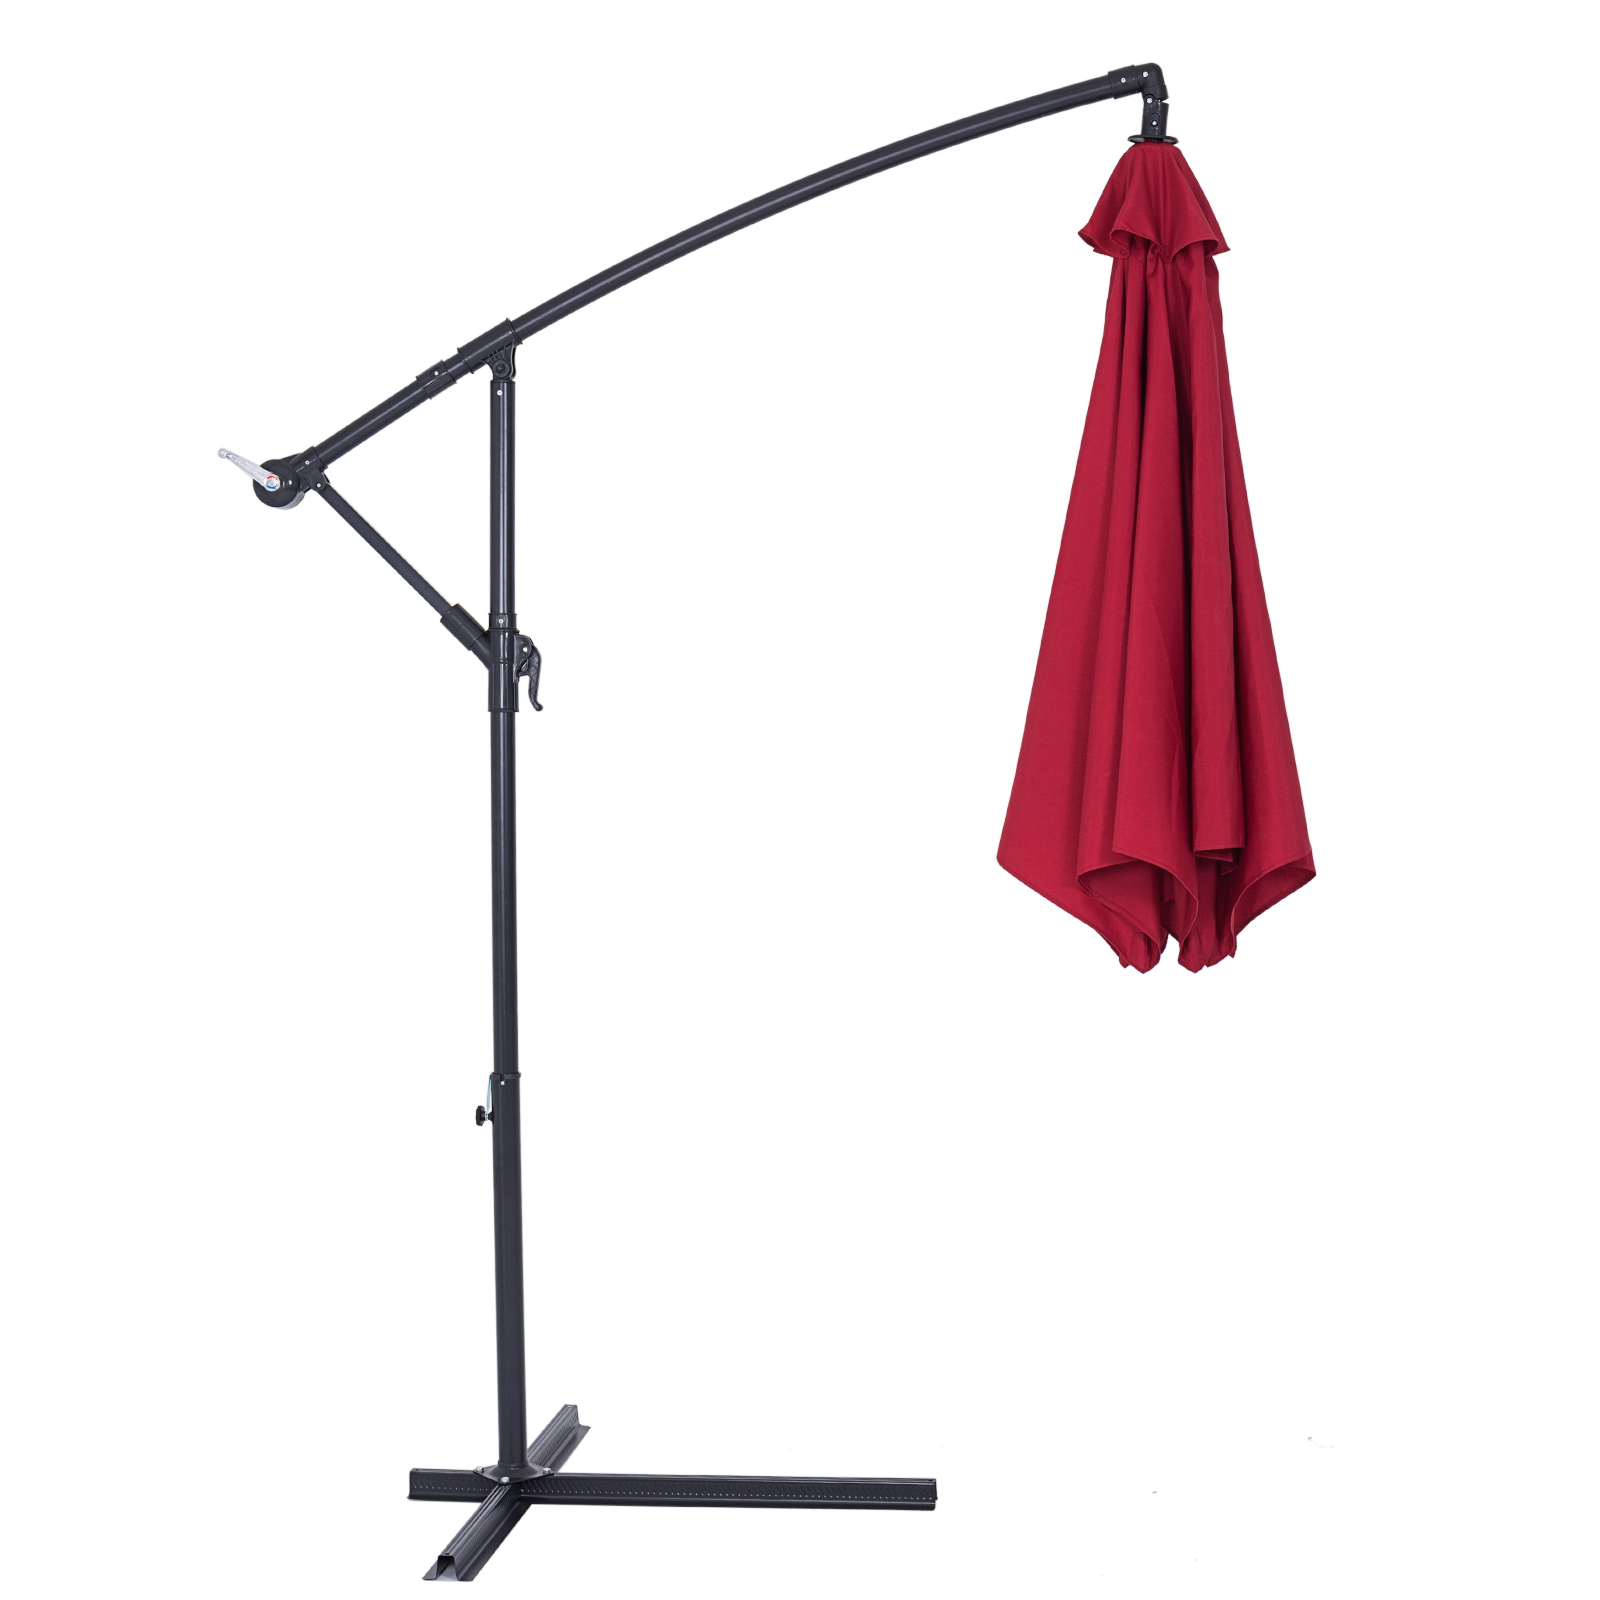 parasol aluminium pare soleil jardin terrasse balcon manivelle 300cm ebay. Black Bedroom Furniture Sets. Home Design Ideas